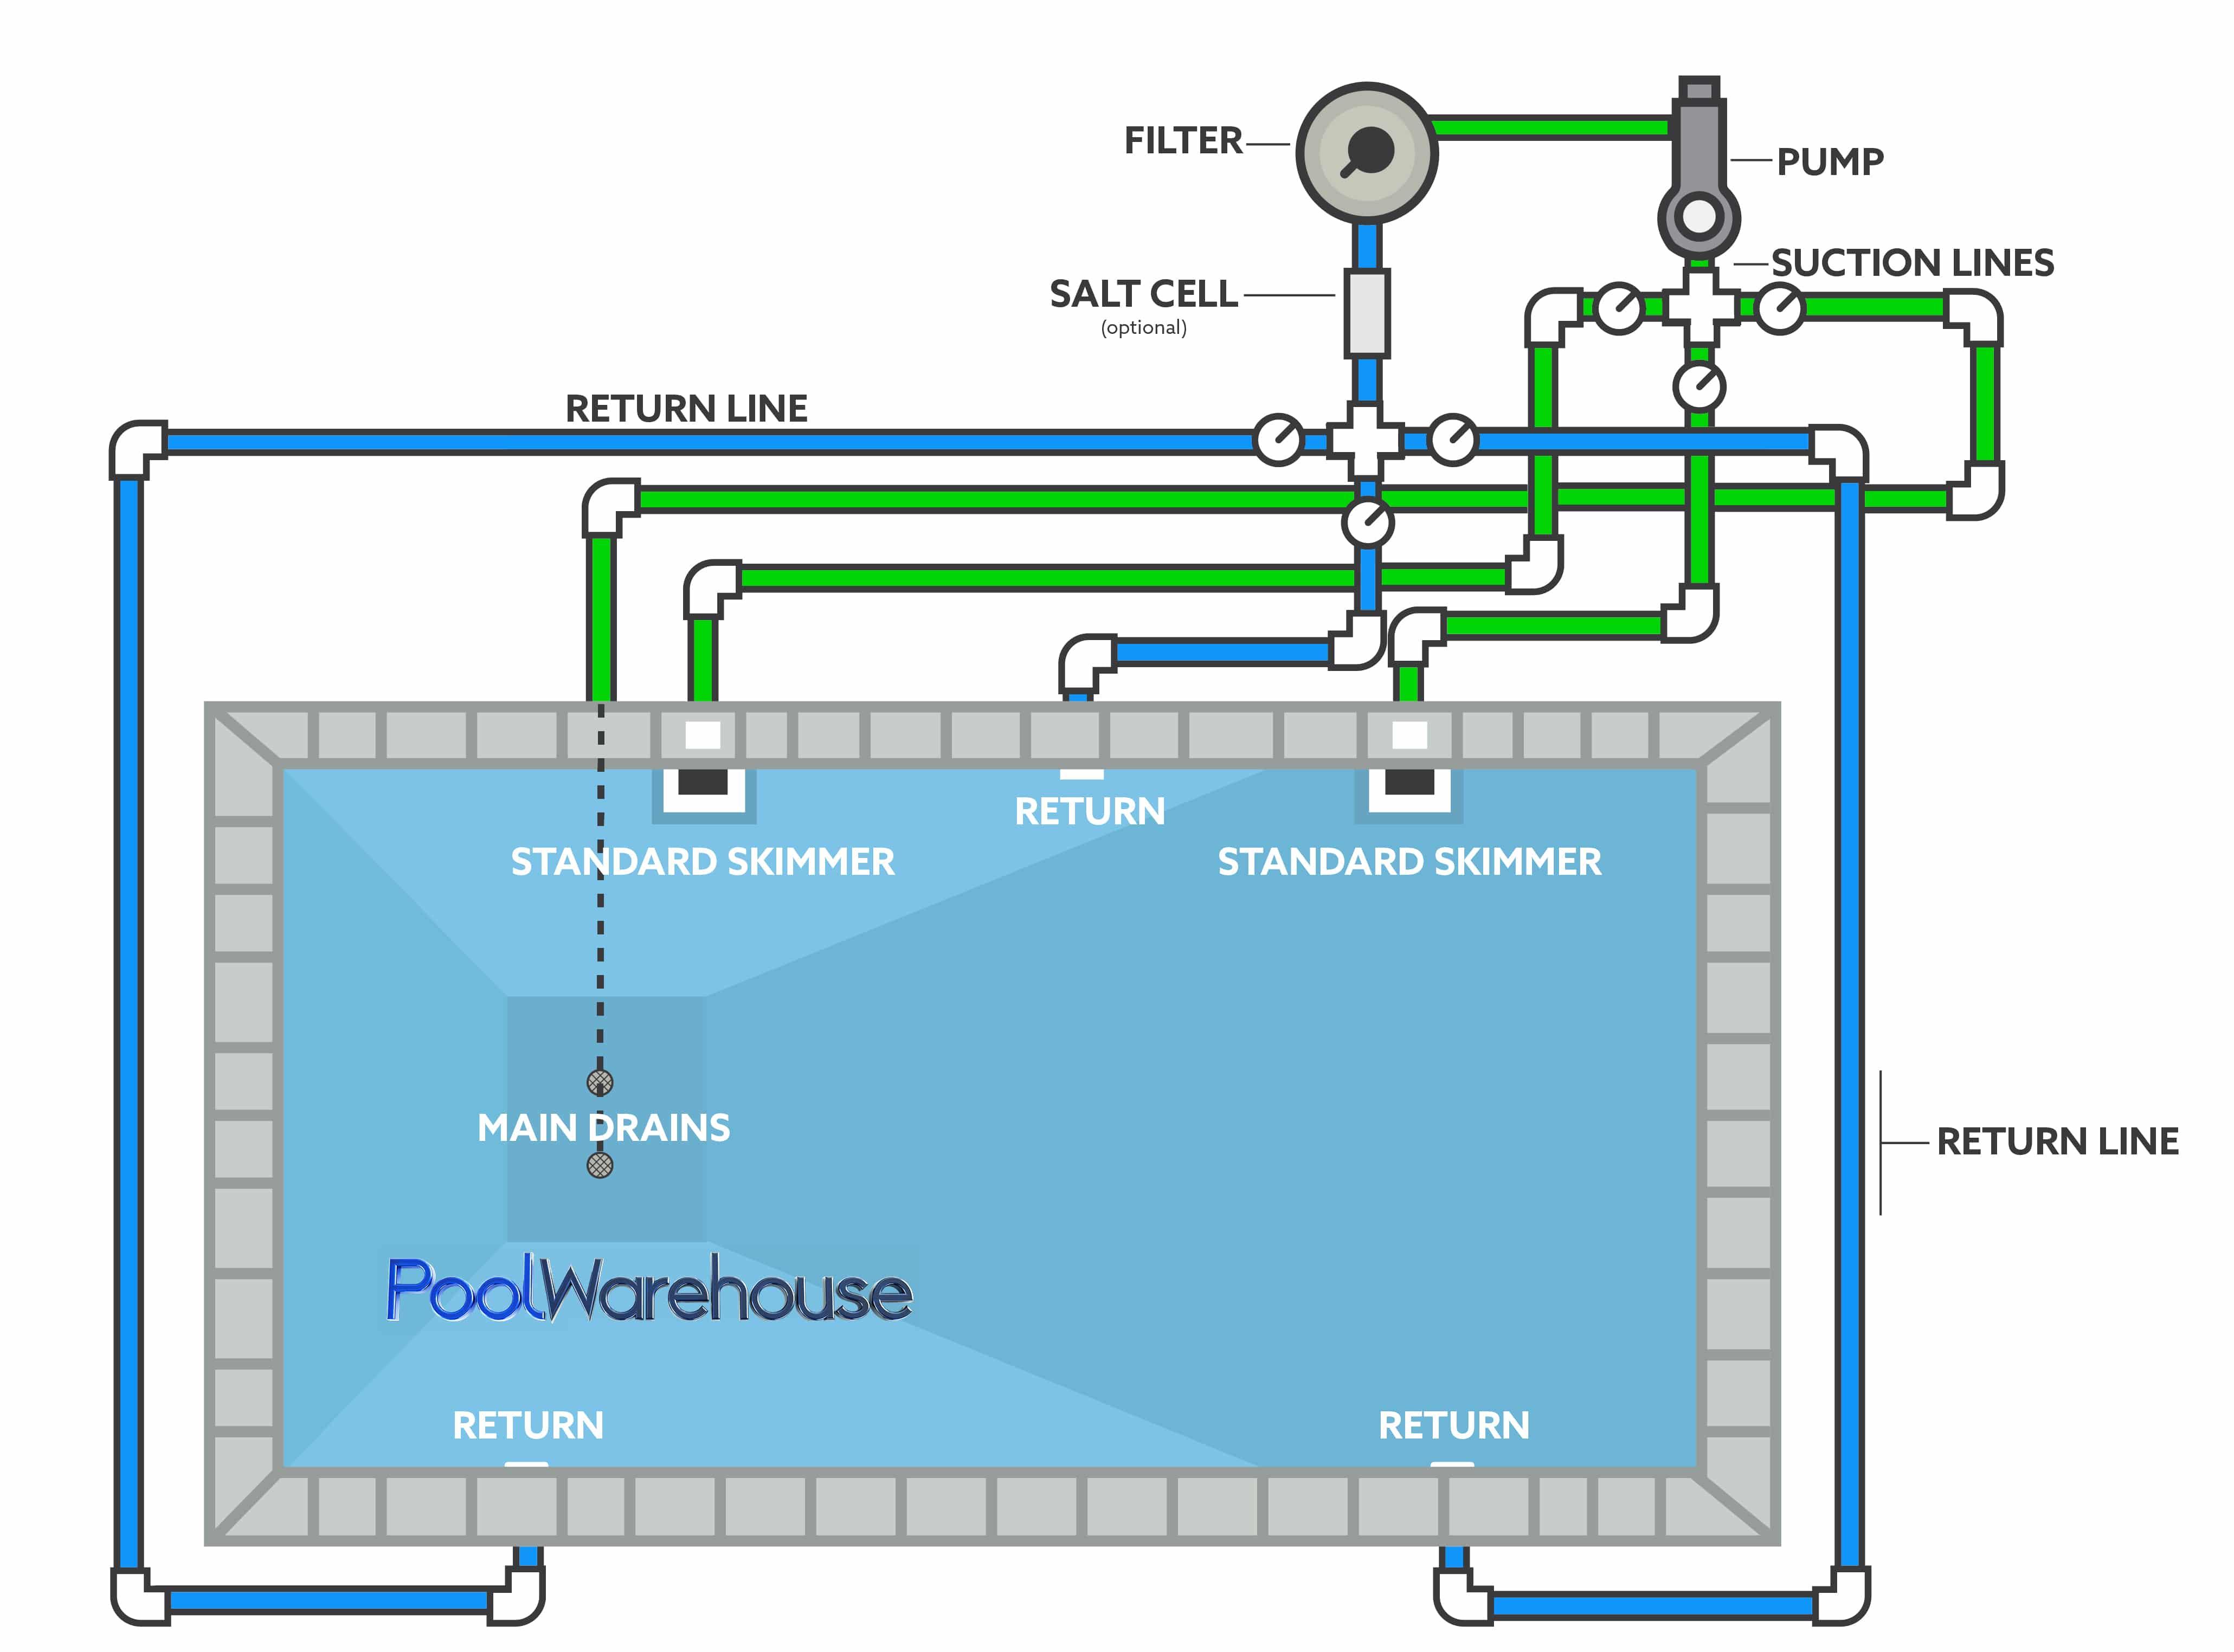 pool pump setup diagram vauxhall astra j towbar wiring above ground pools plumbing all data swimming diagrams inground kit layouts